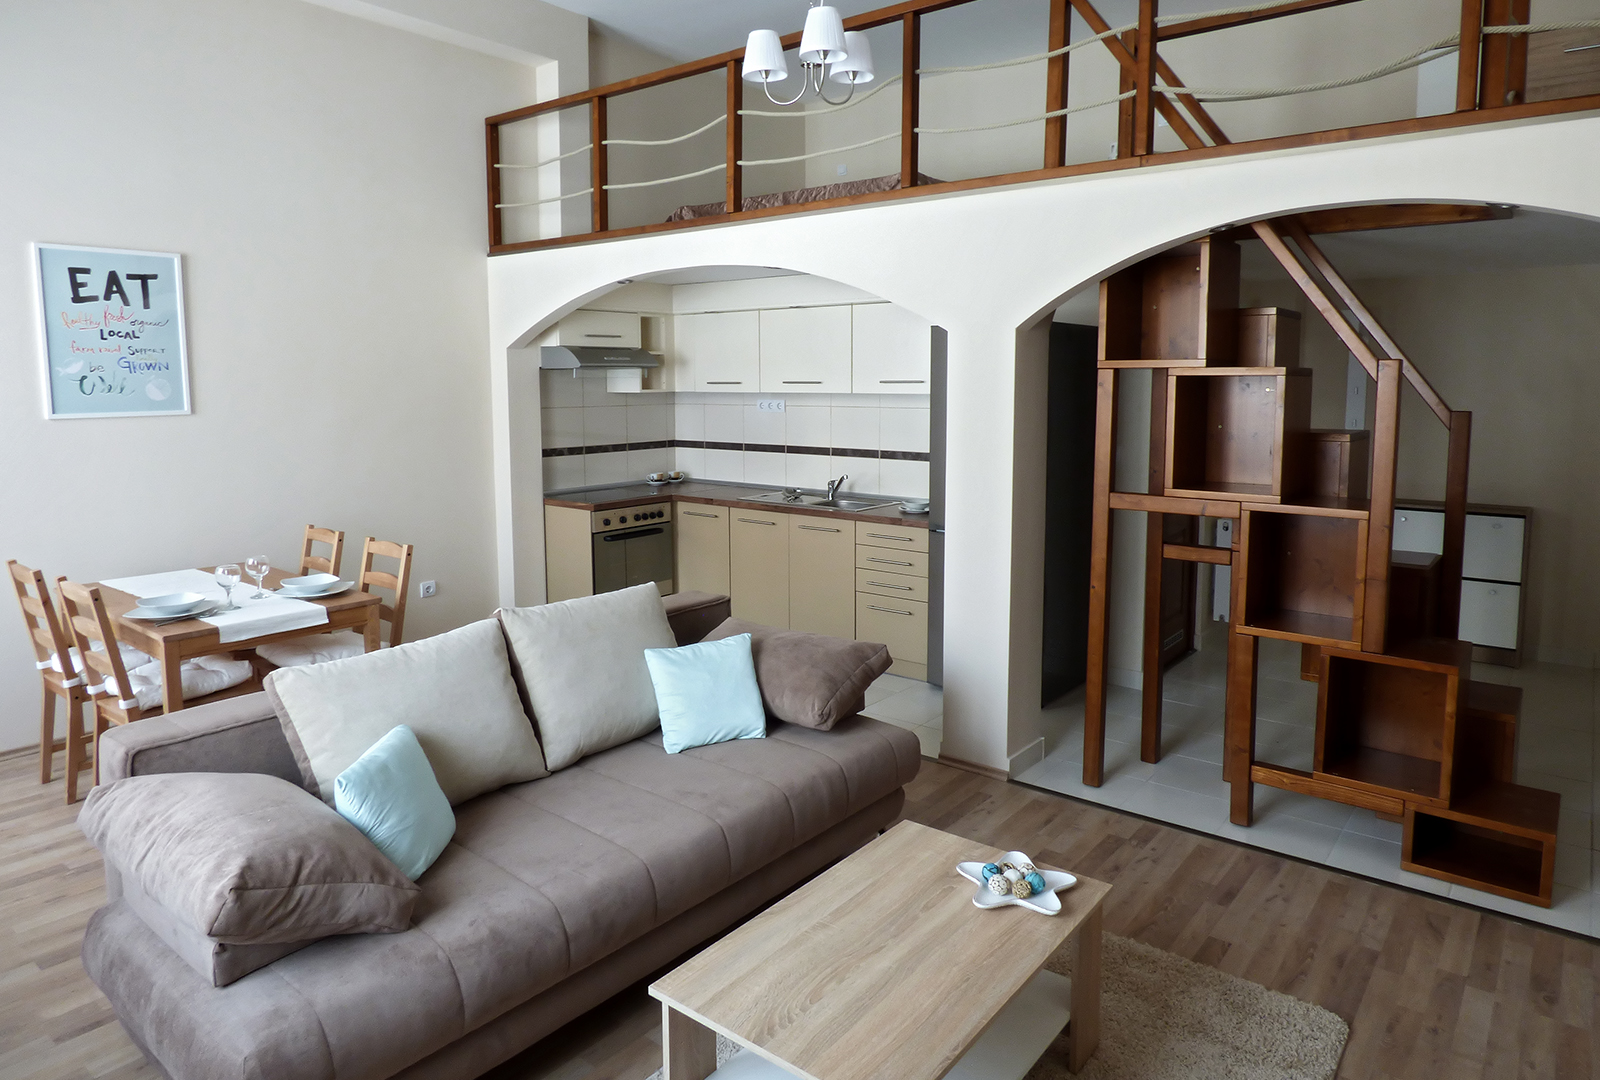 Nagy Lajos király úti ingatlan, 39 m² + 17 m² galéria – Lakás